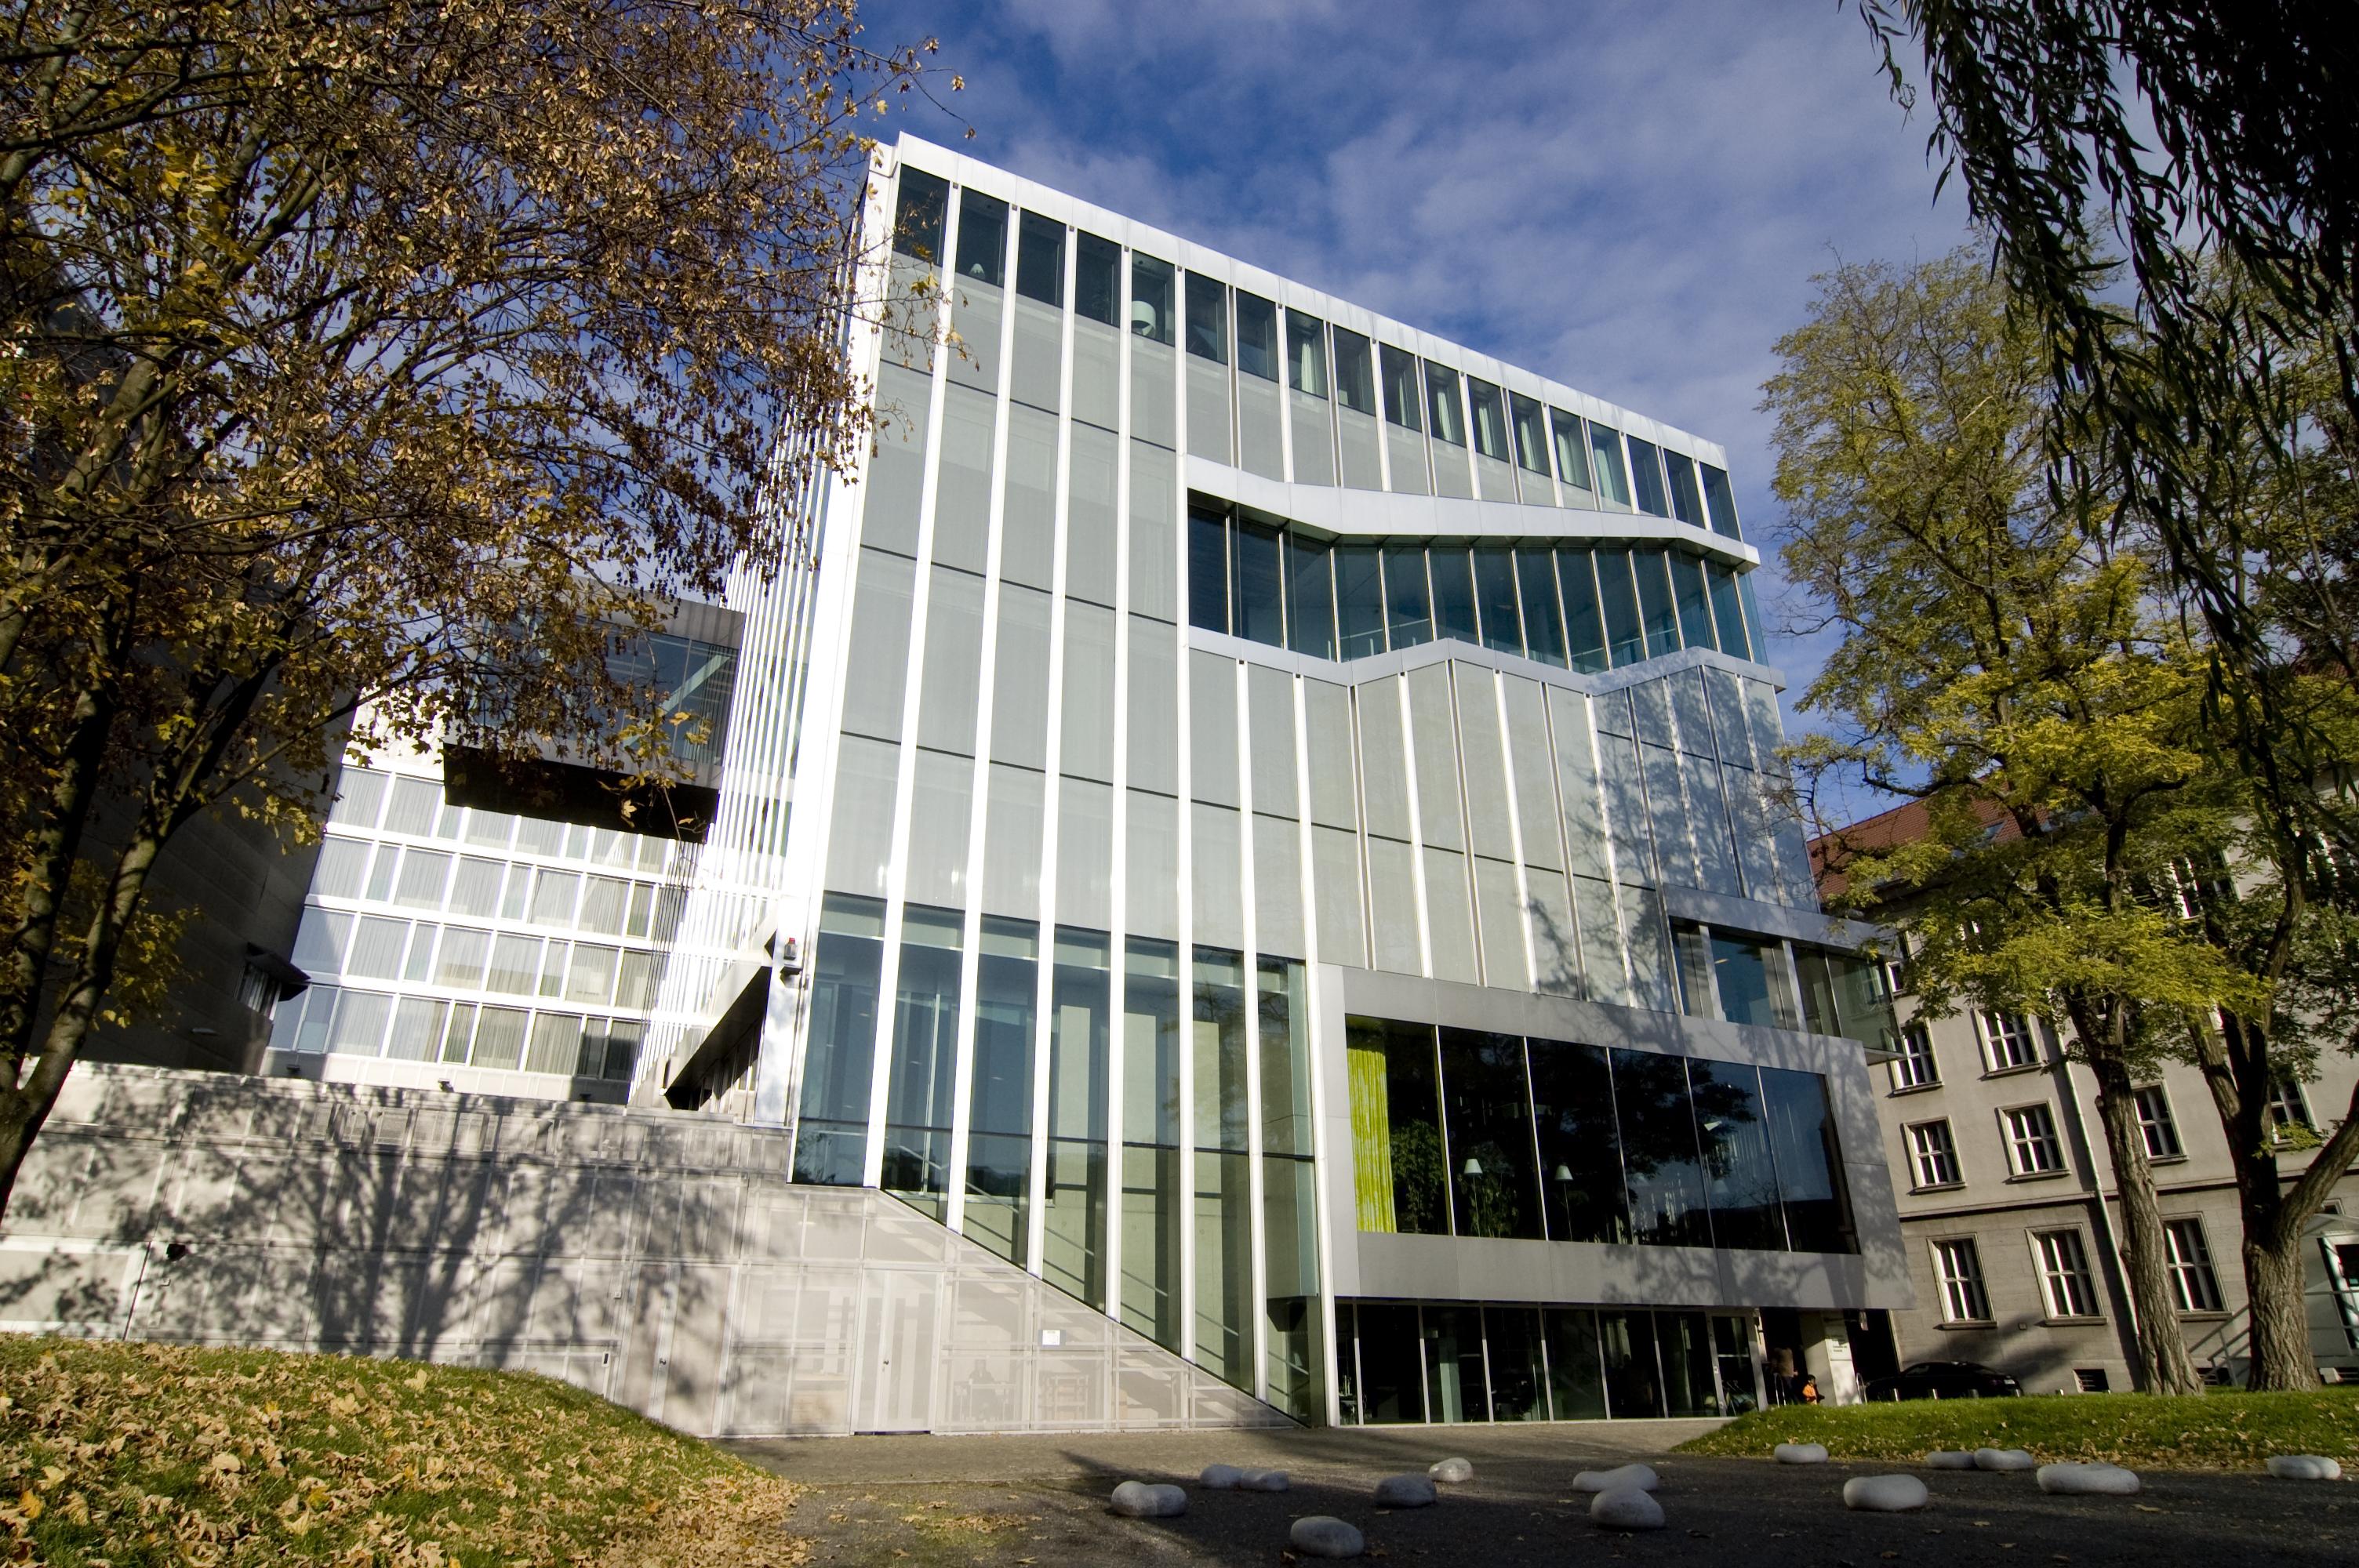 nederlandse-ambassade-duitsland-berlijn.jpg